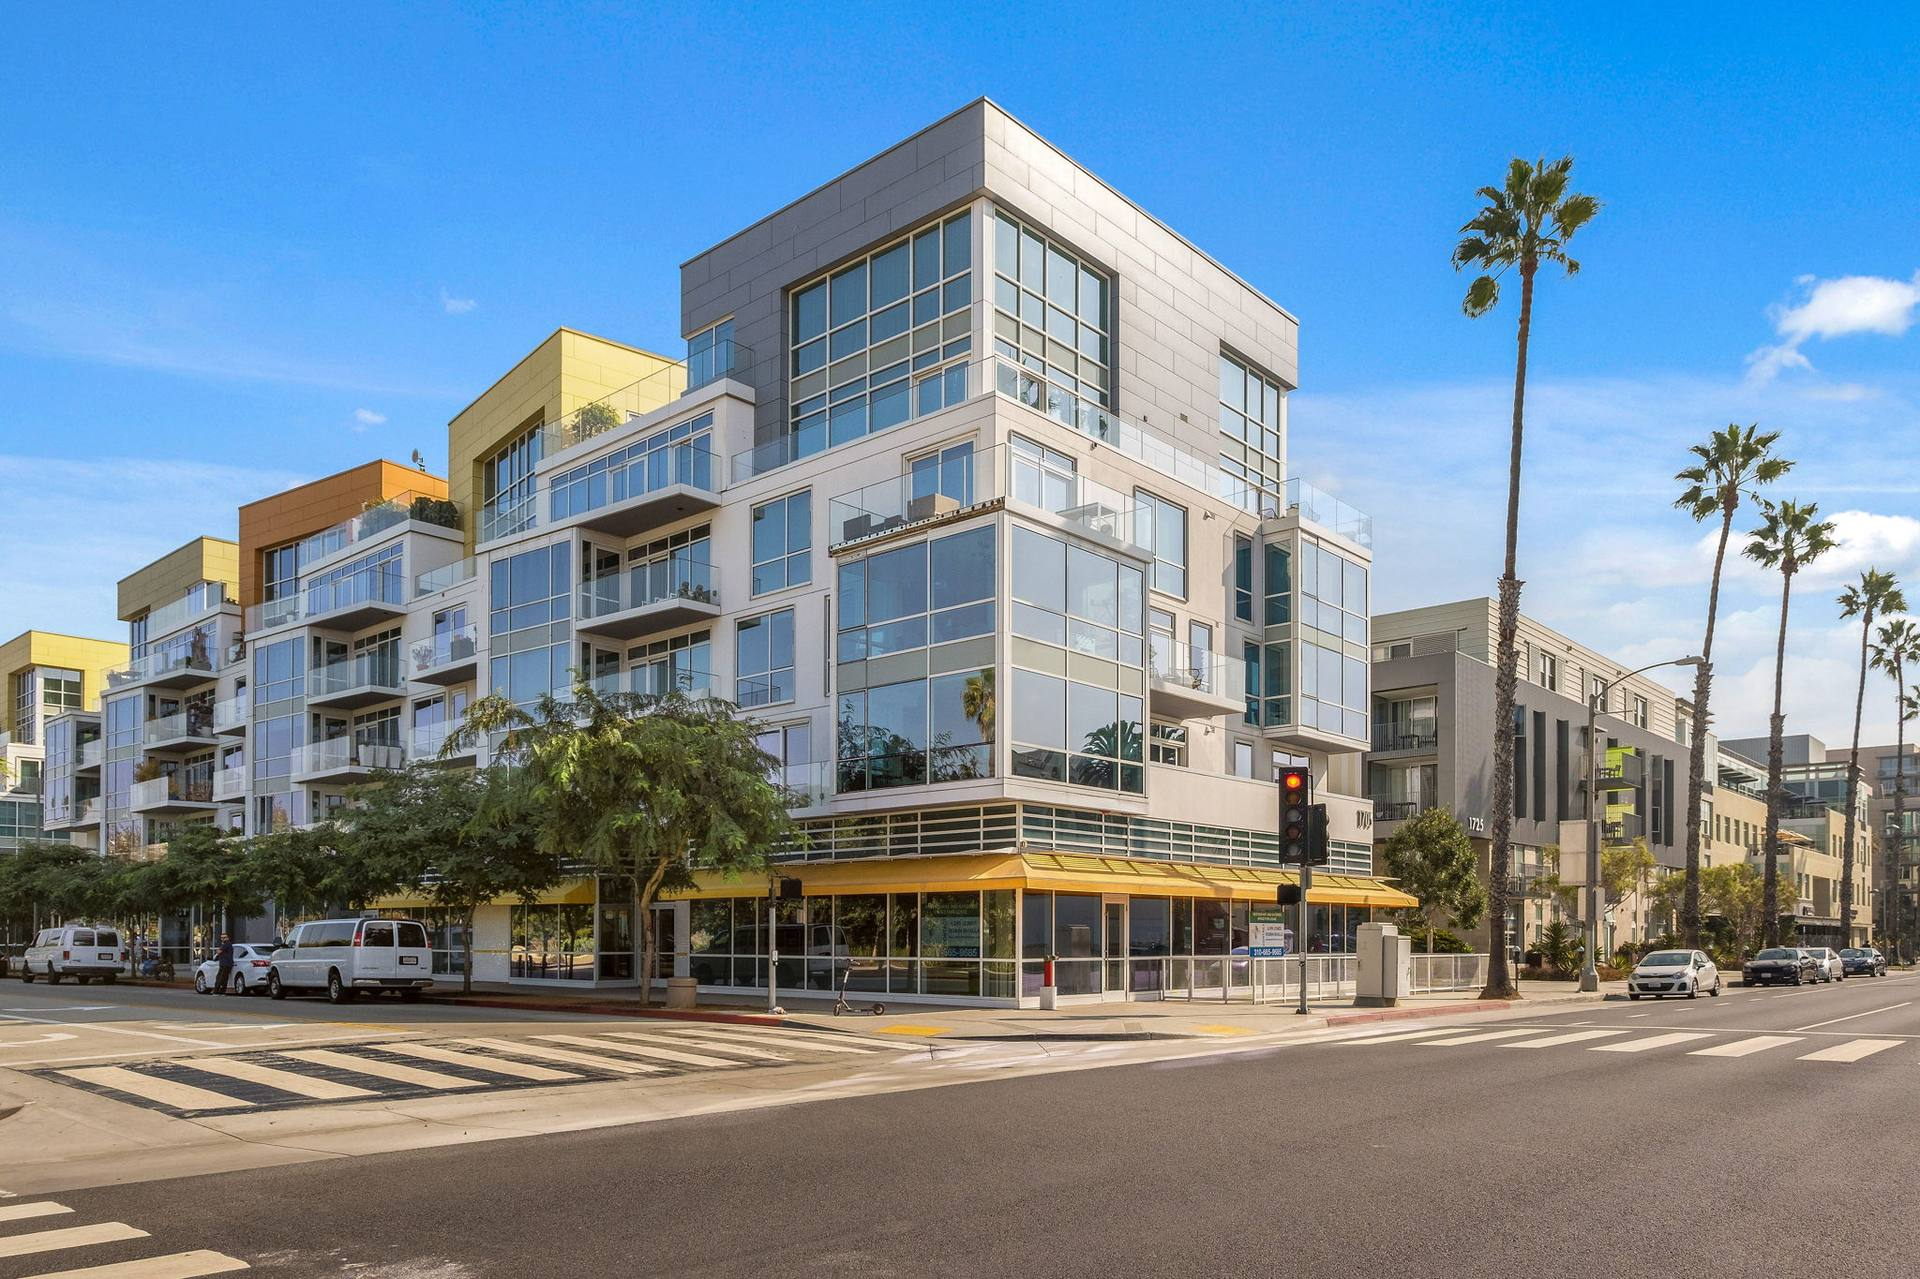 1705 Ocean Ave, Santa Monica, CA 90401, US